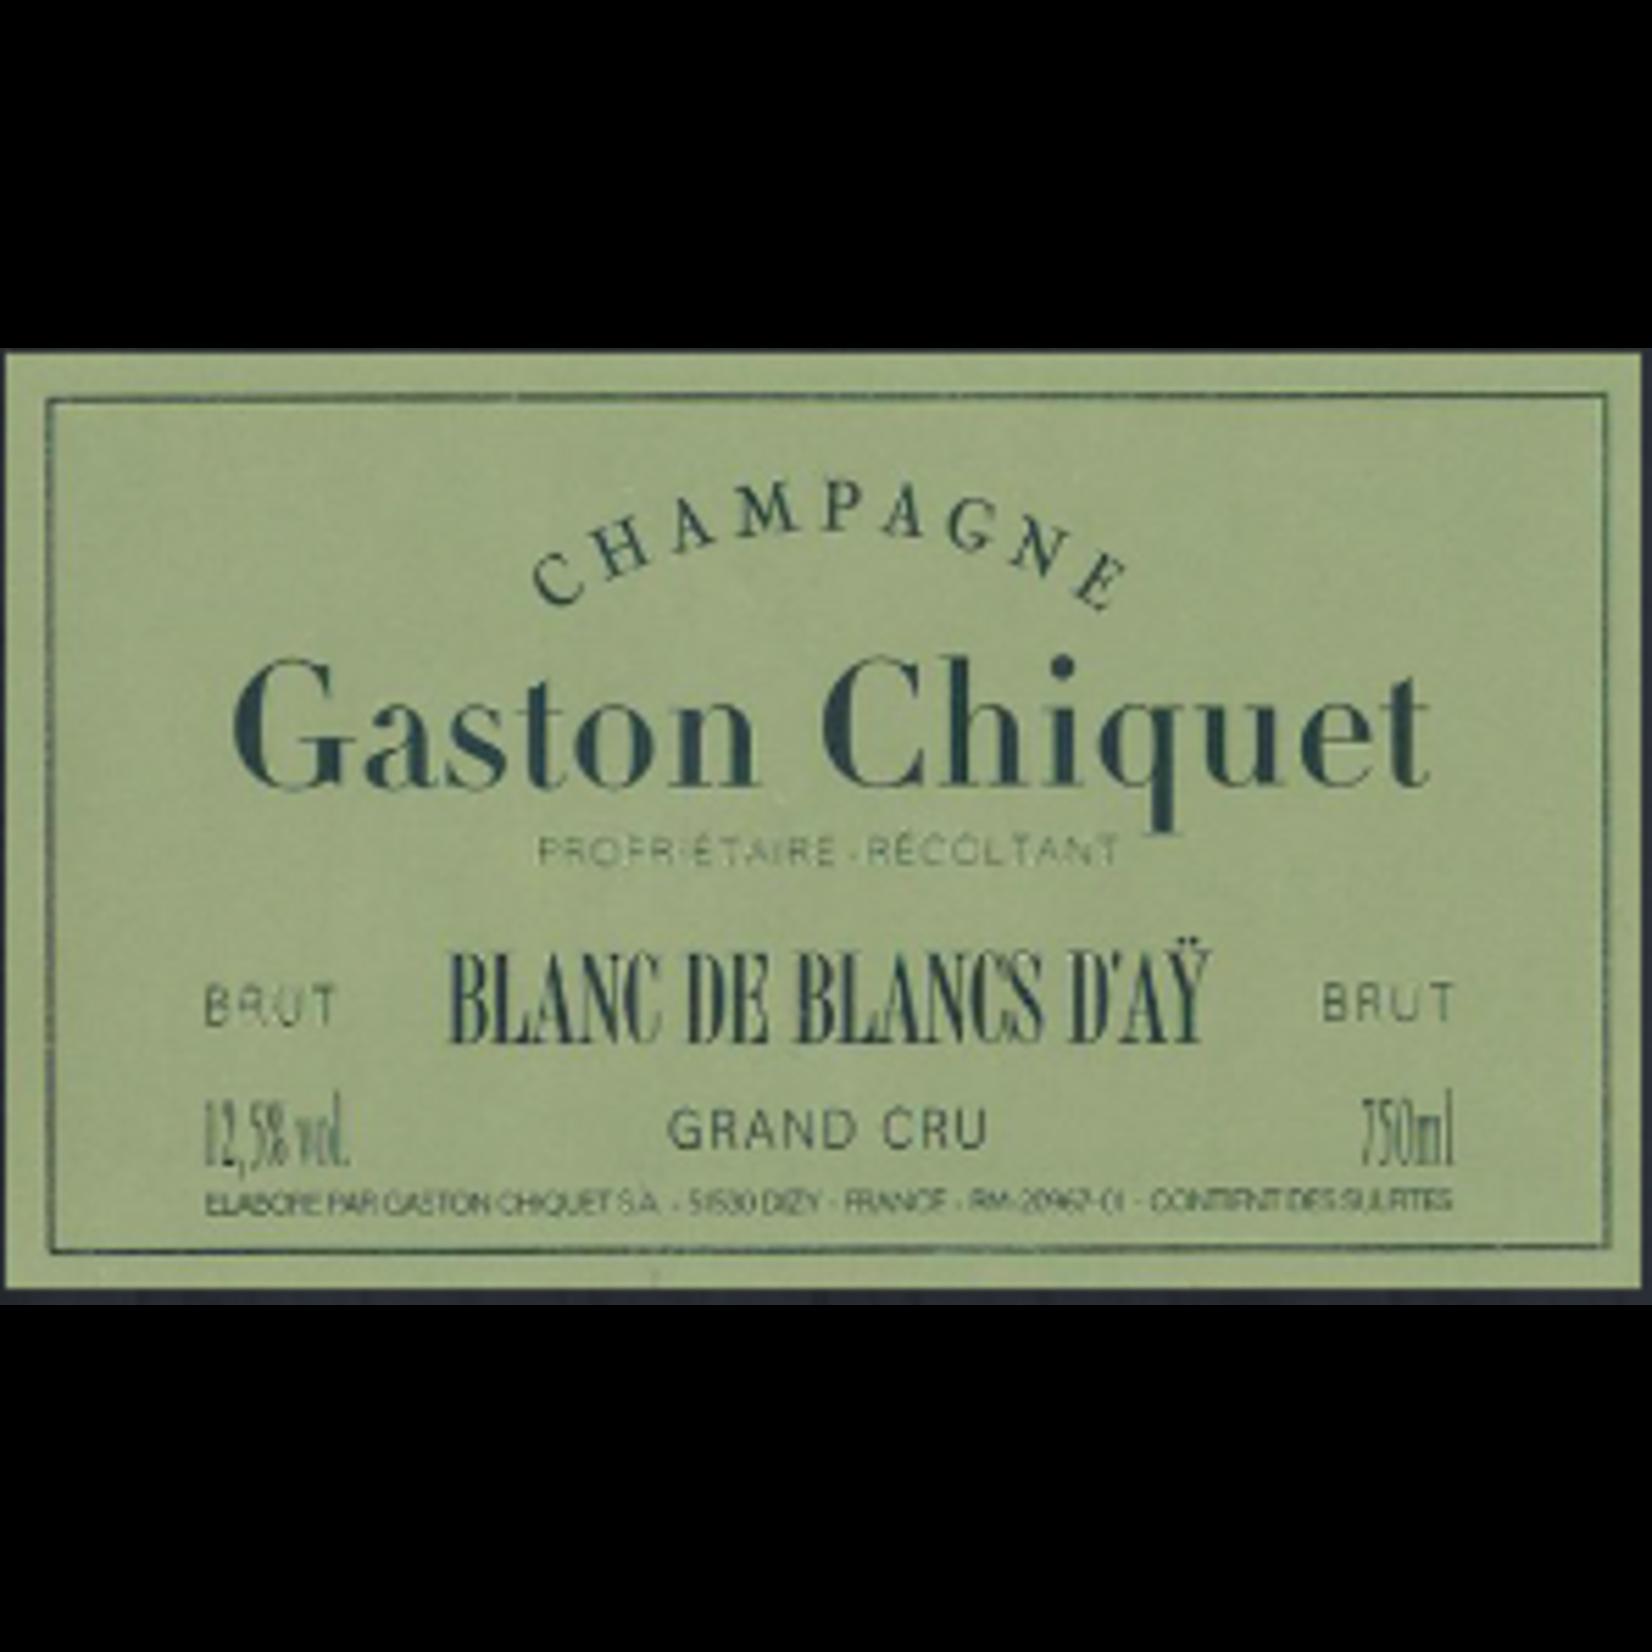 Gaston Chiquet Gaston Chiquet Blanc De Blanc D'Ay Grand Cru Champagne Champagne, France